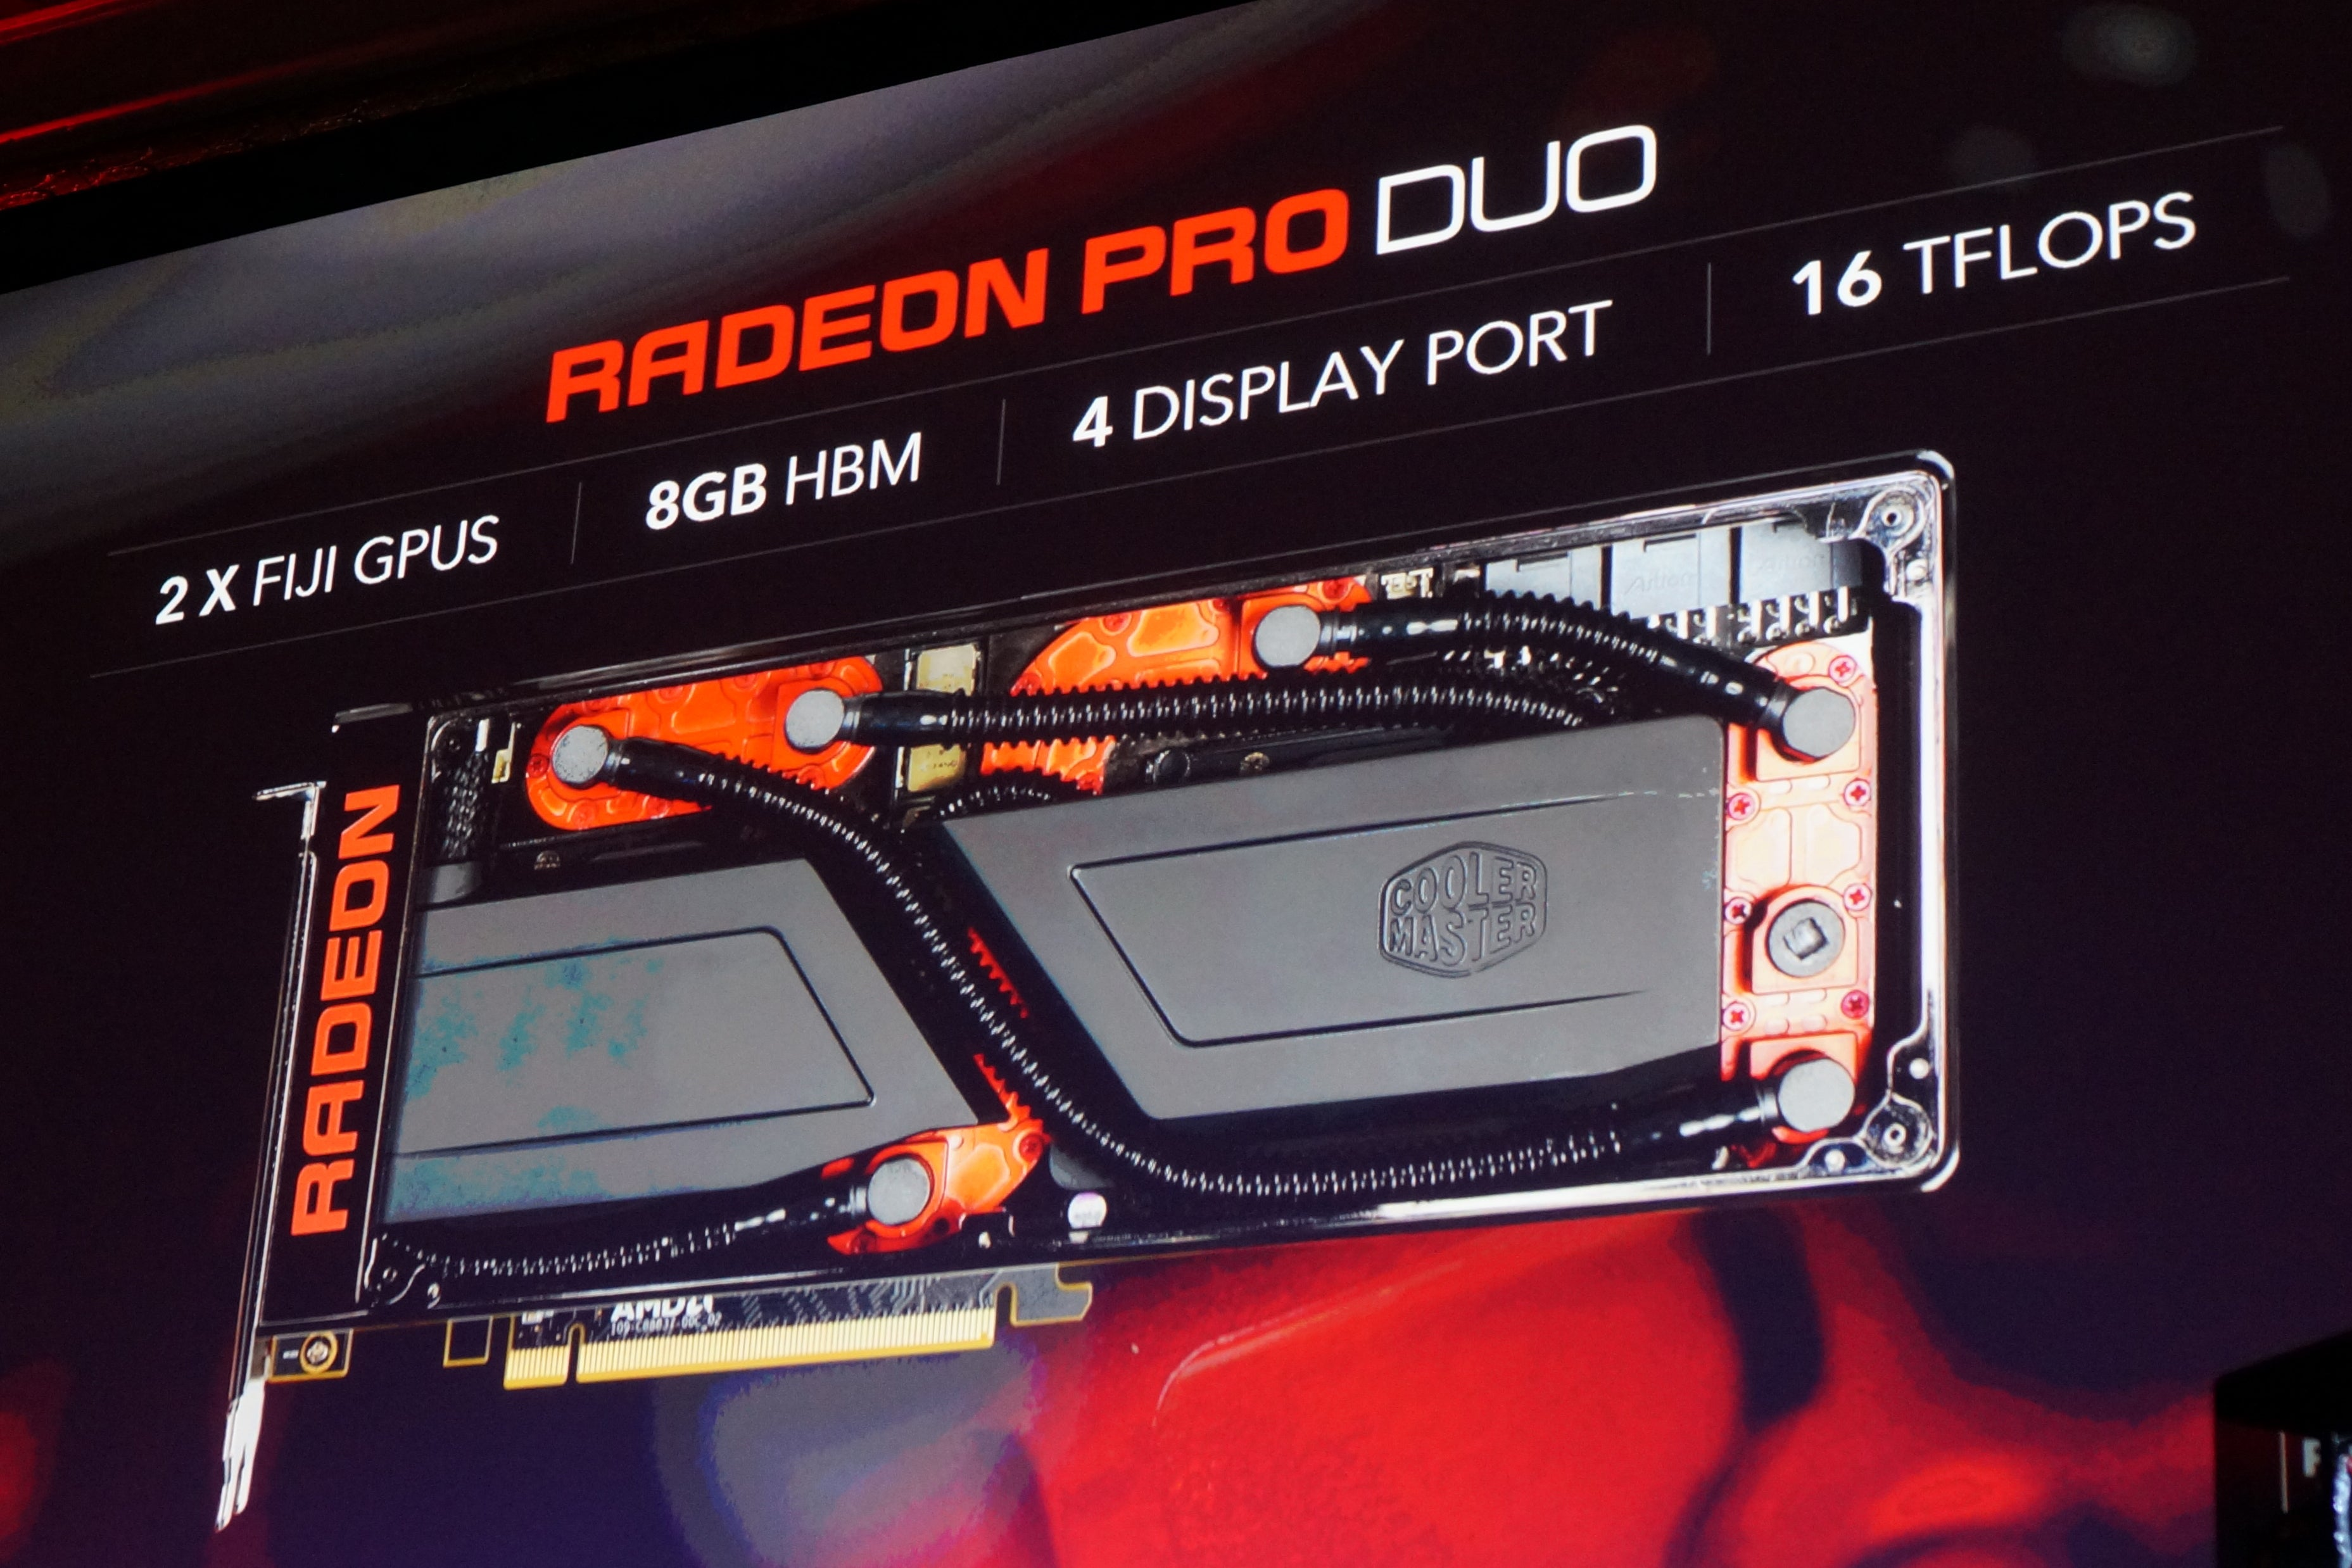 AMD's $1,500 dual-GPU Radeon Pro Duo graphics card is built